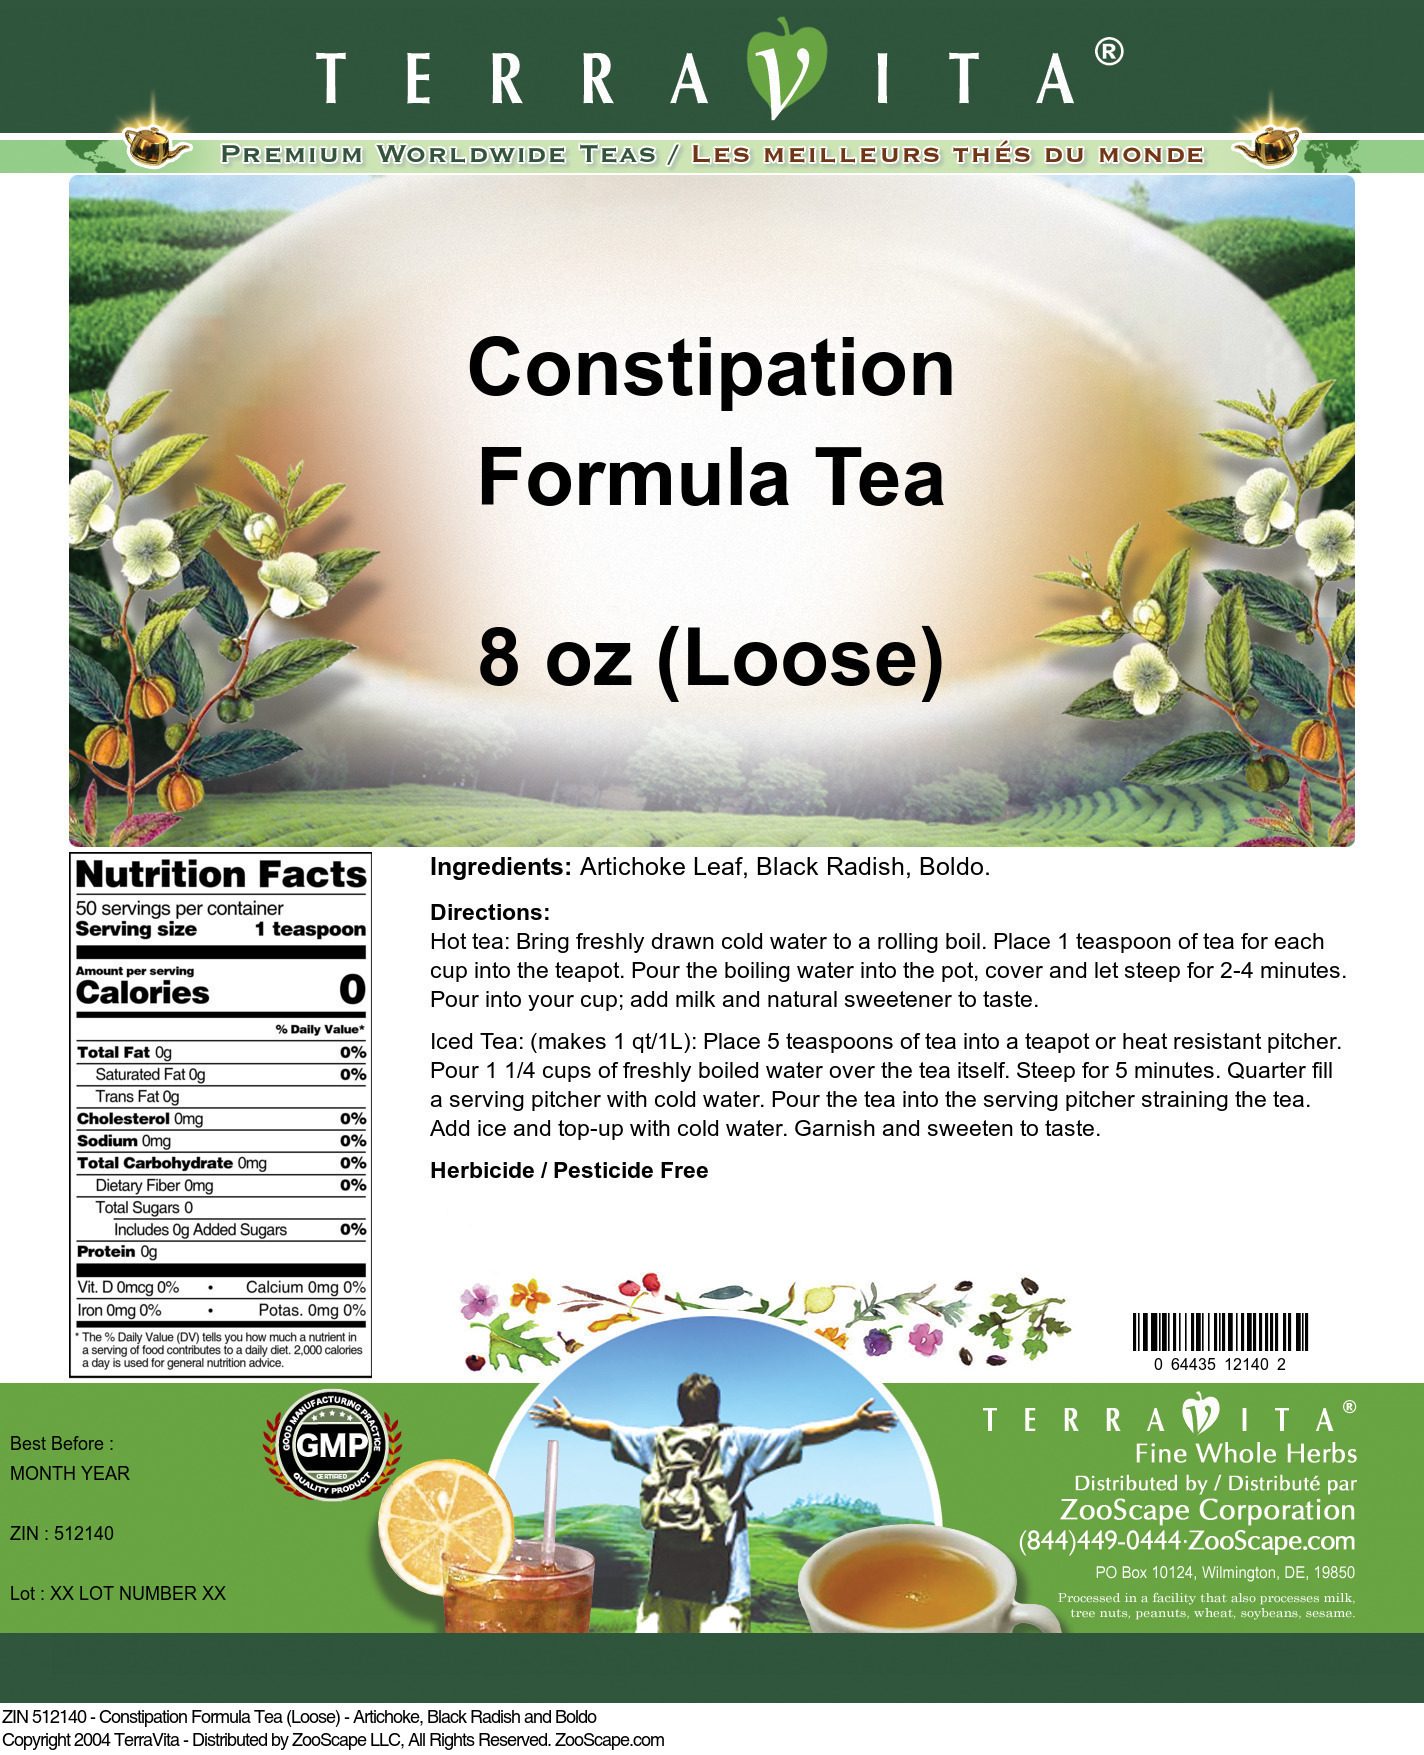 Constipation Formula